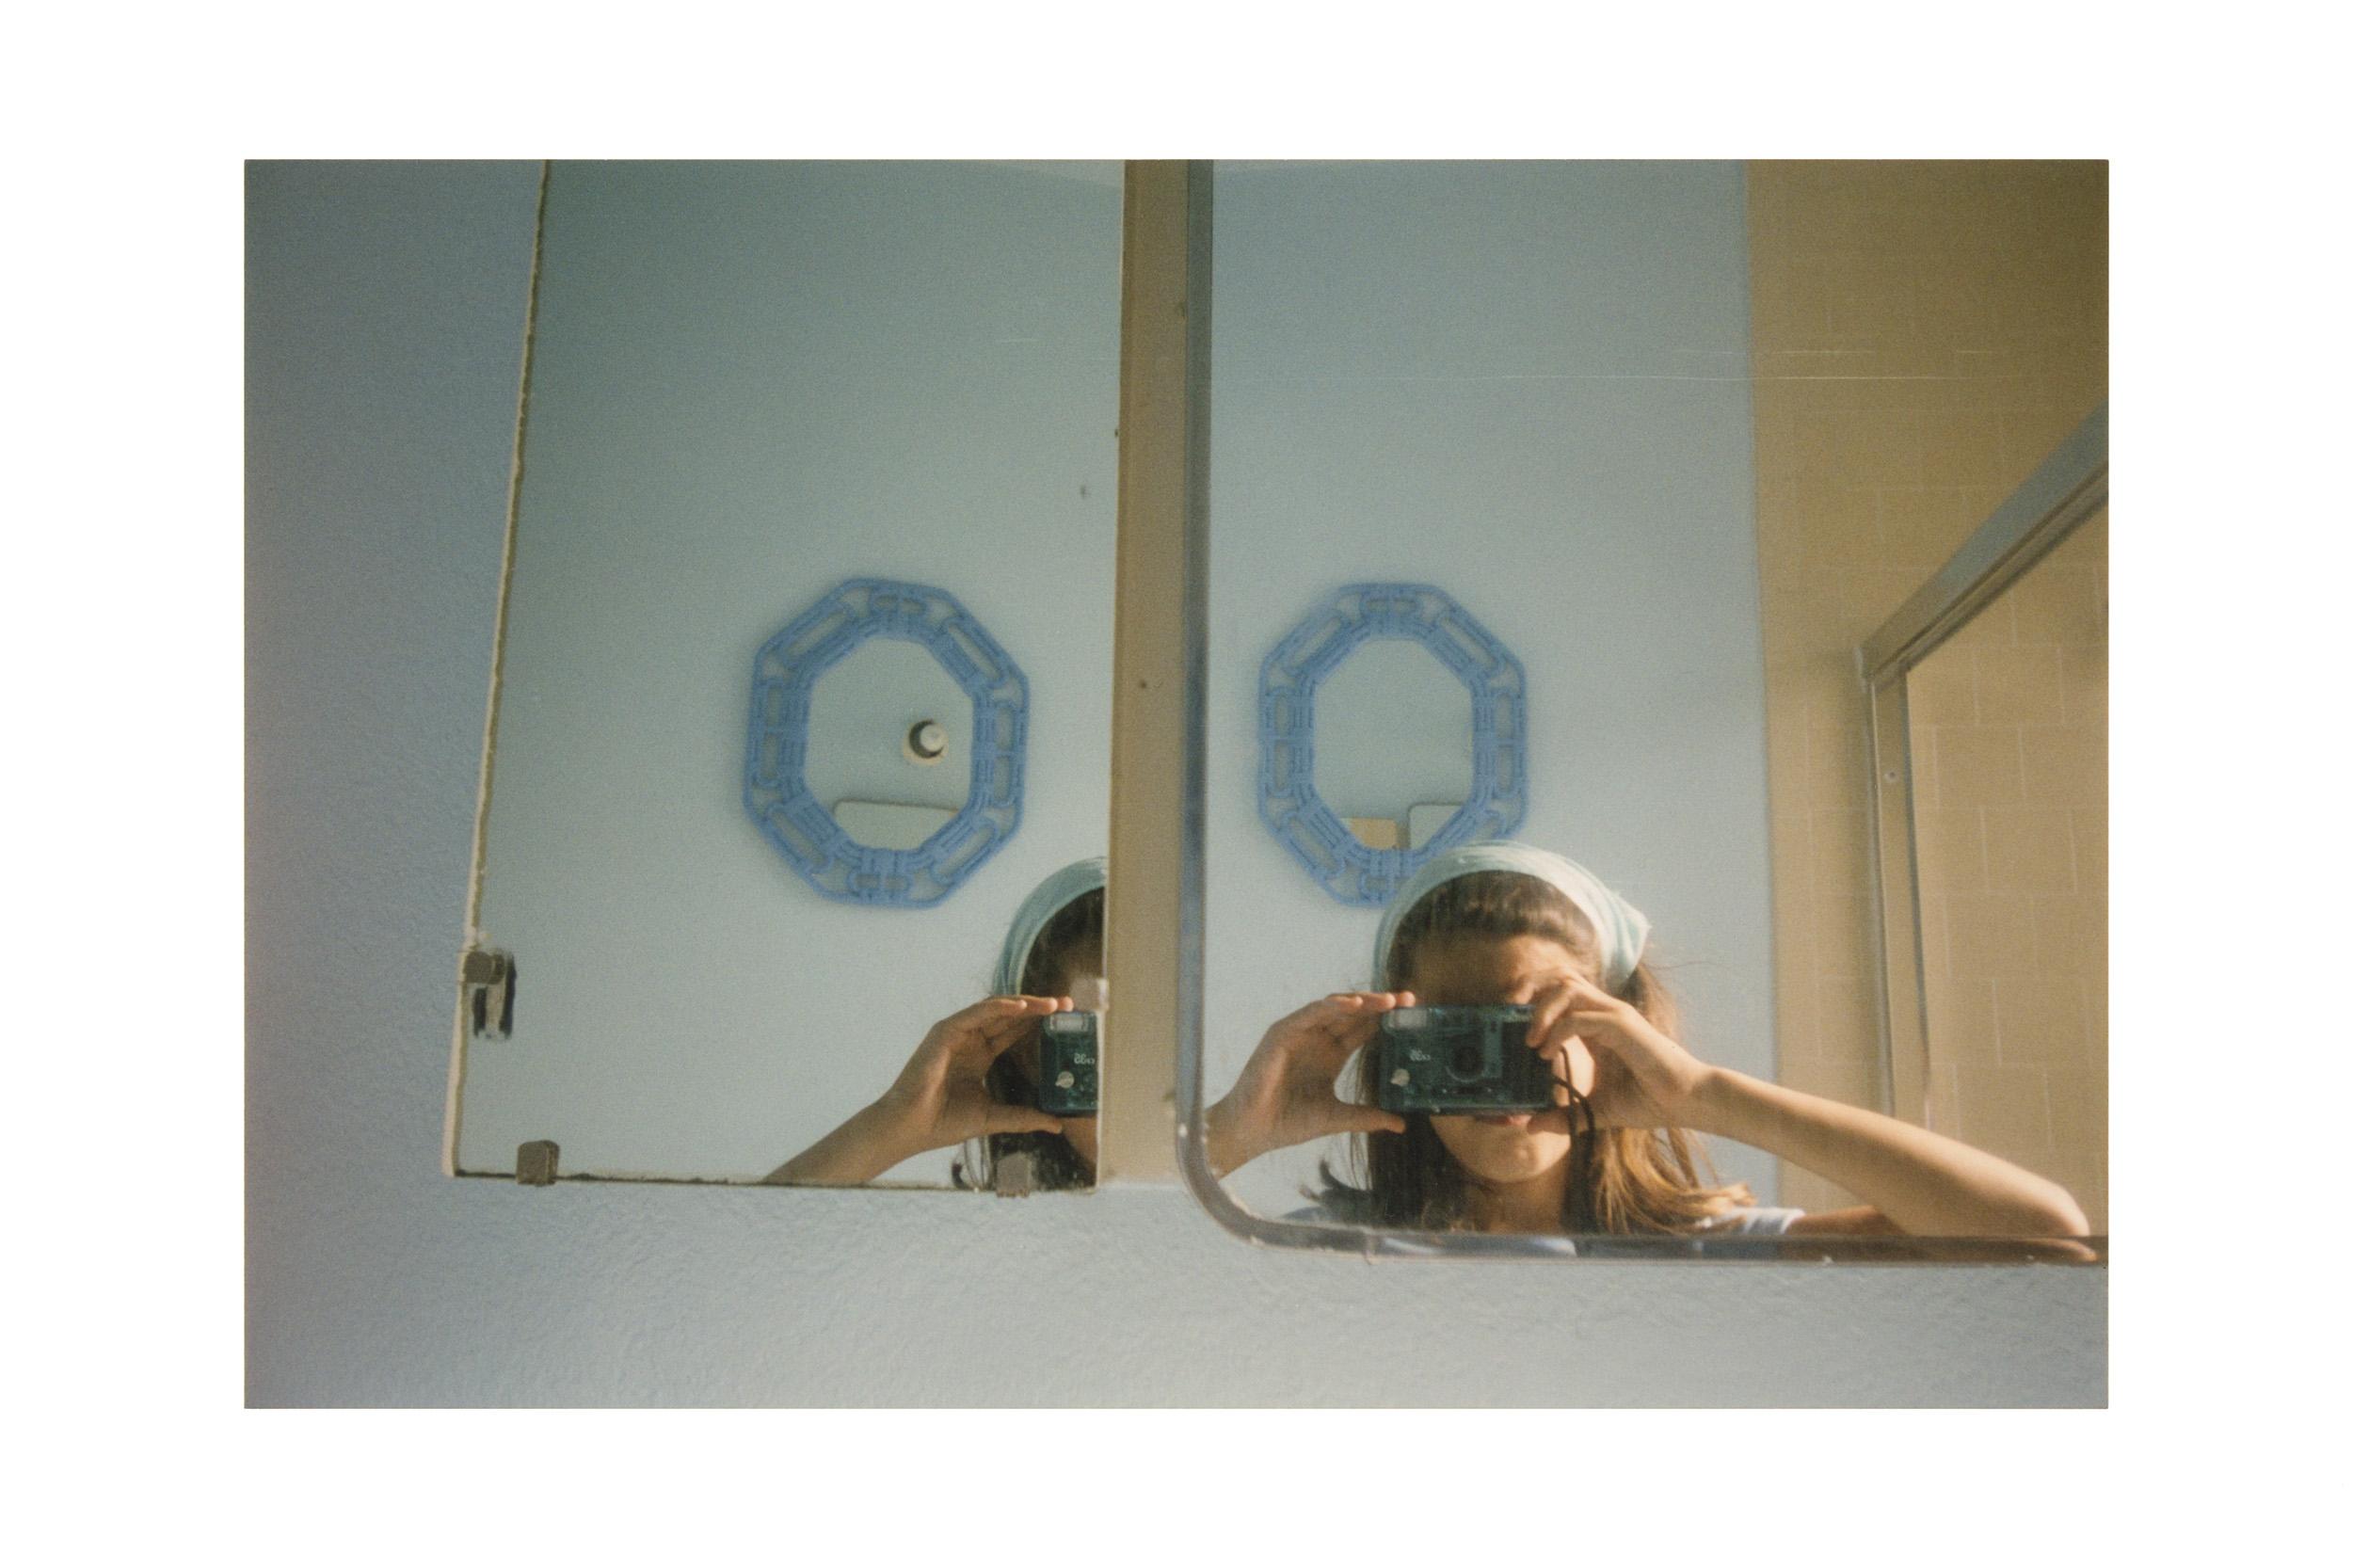 Anne Collier, aus der Serie Women With Cameras (Self Portrait), 2017 © Anne Collier Courtesy of the artist; Anton Kern Gallery, New York; Galerie Neu, Berlin; and The Modern Institute/Toby Webster Ltd., Glasgow